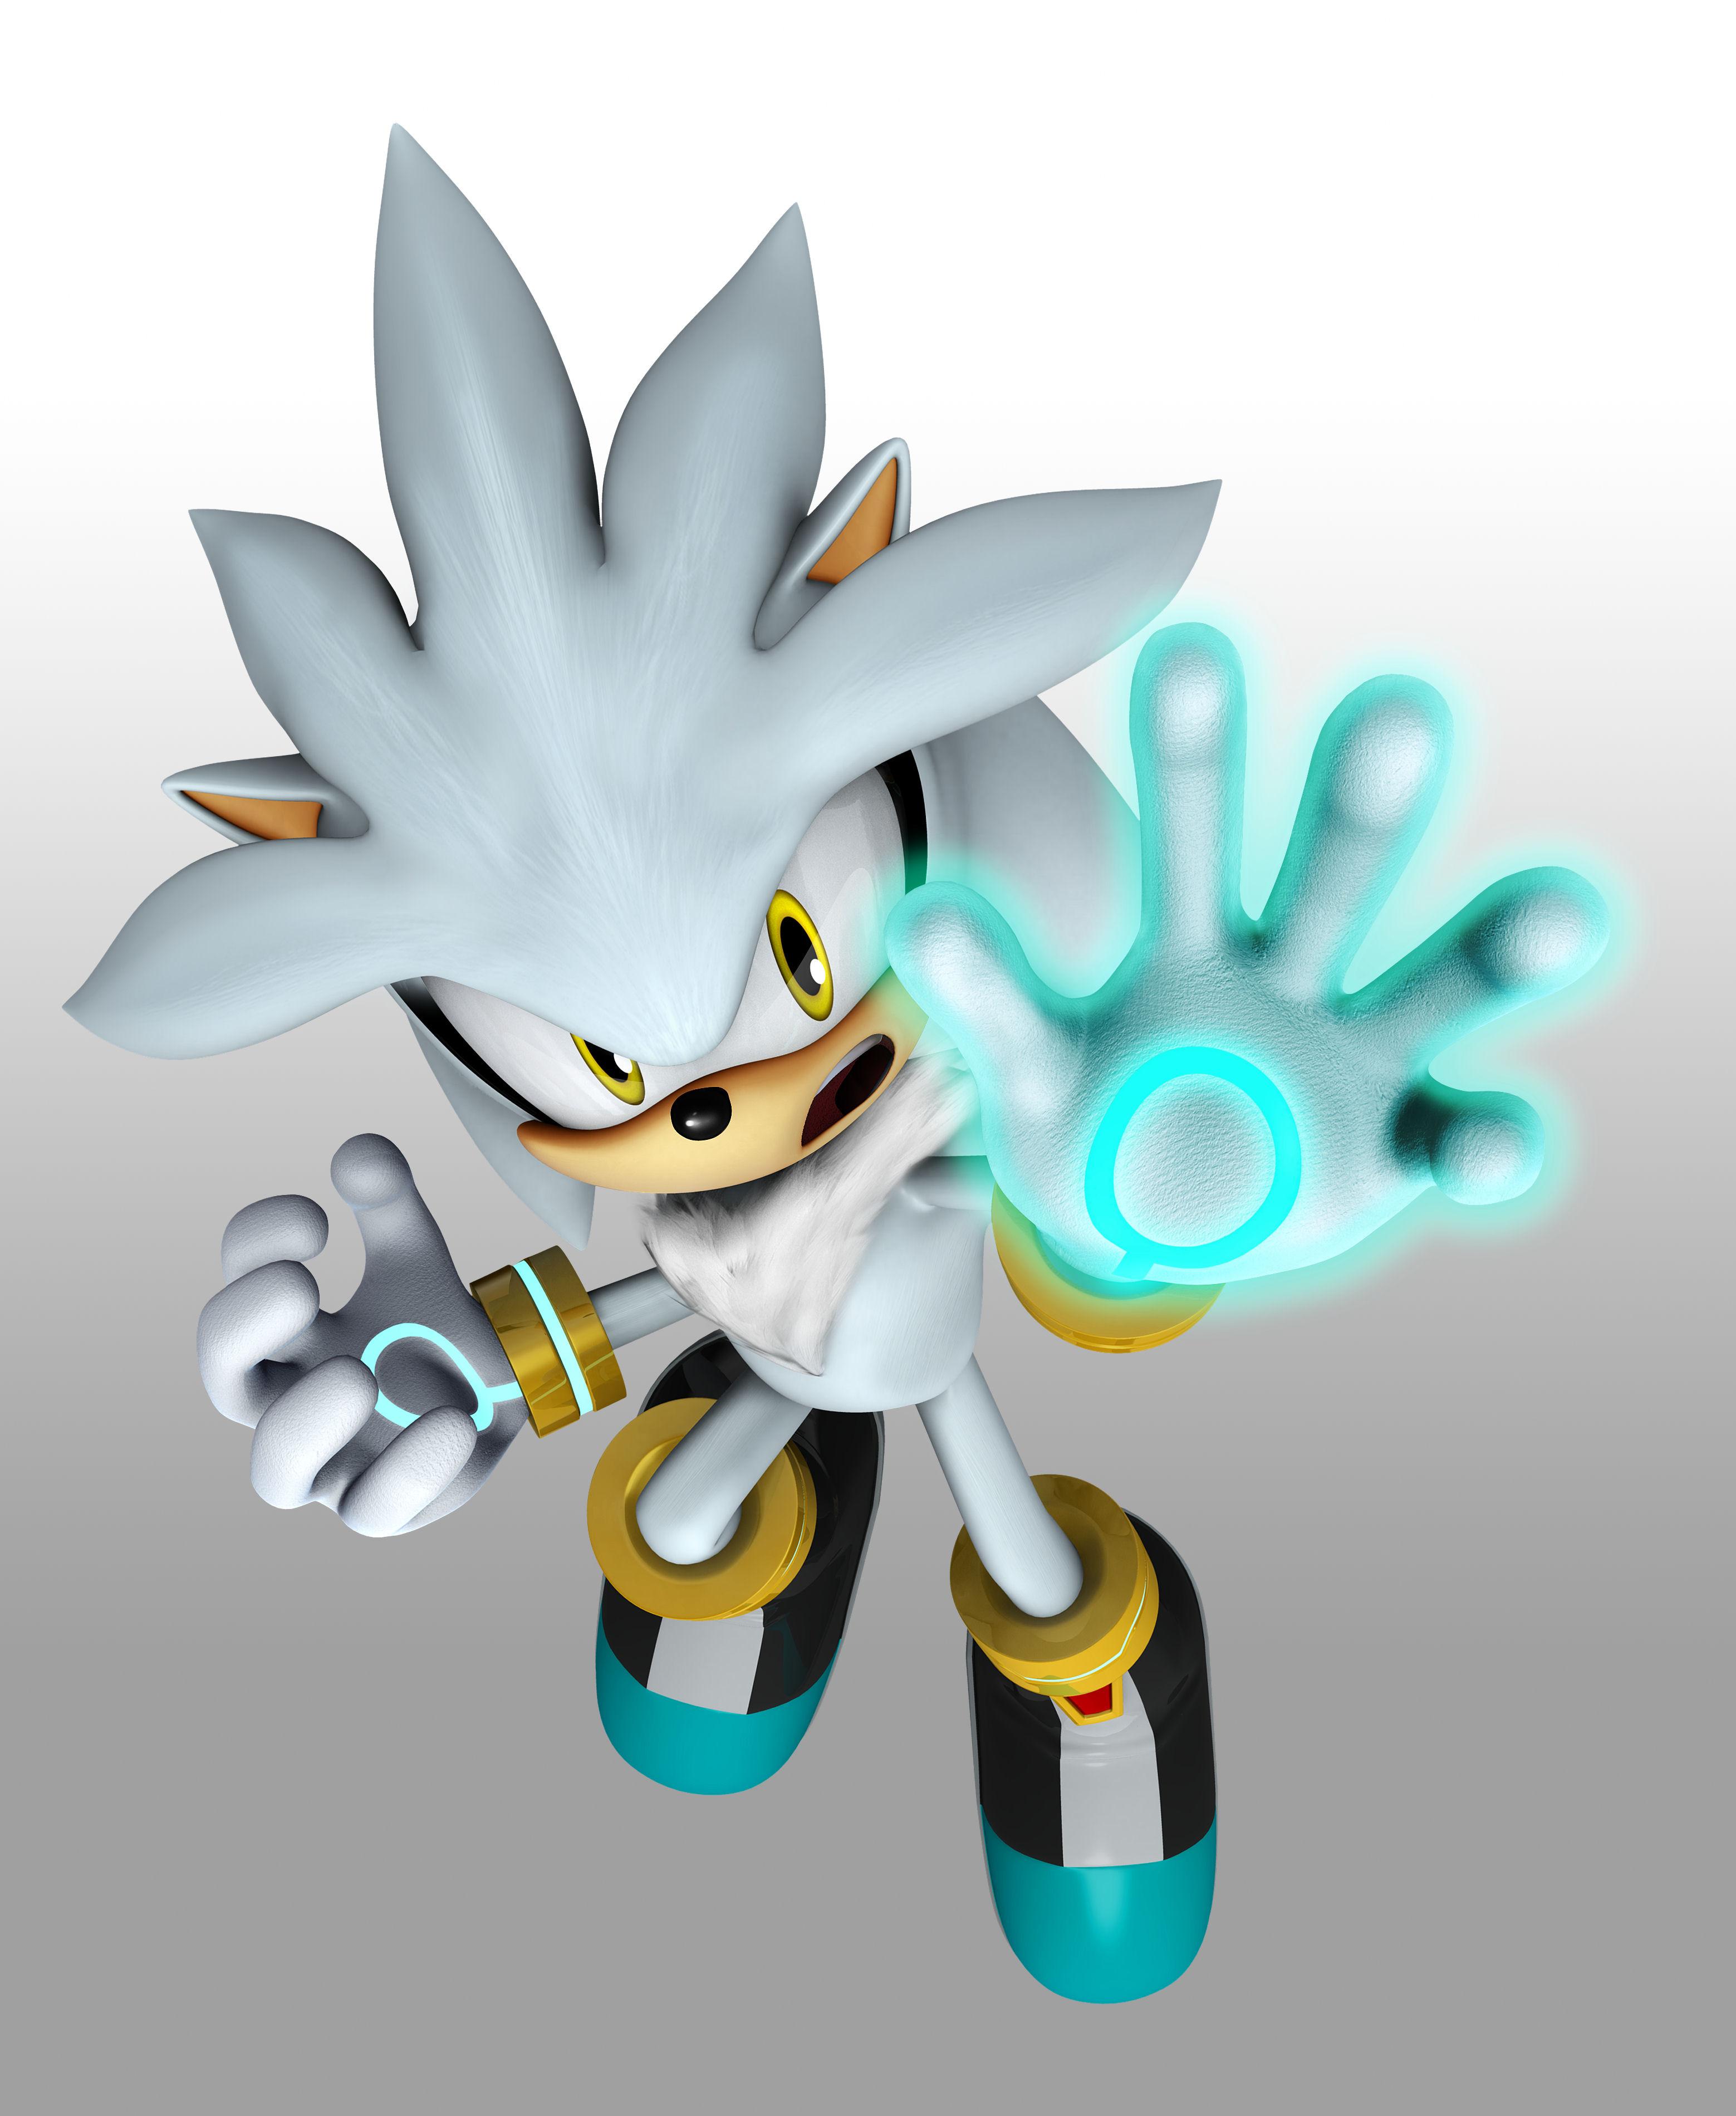 sonic the hedgehog digital - photo #24